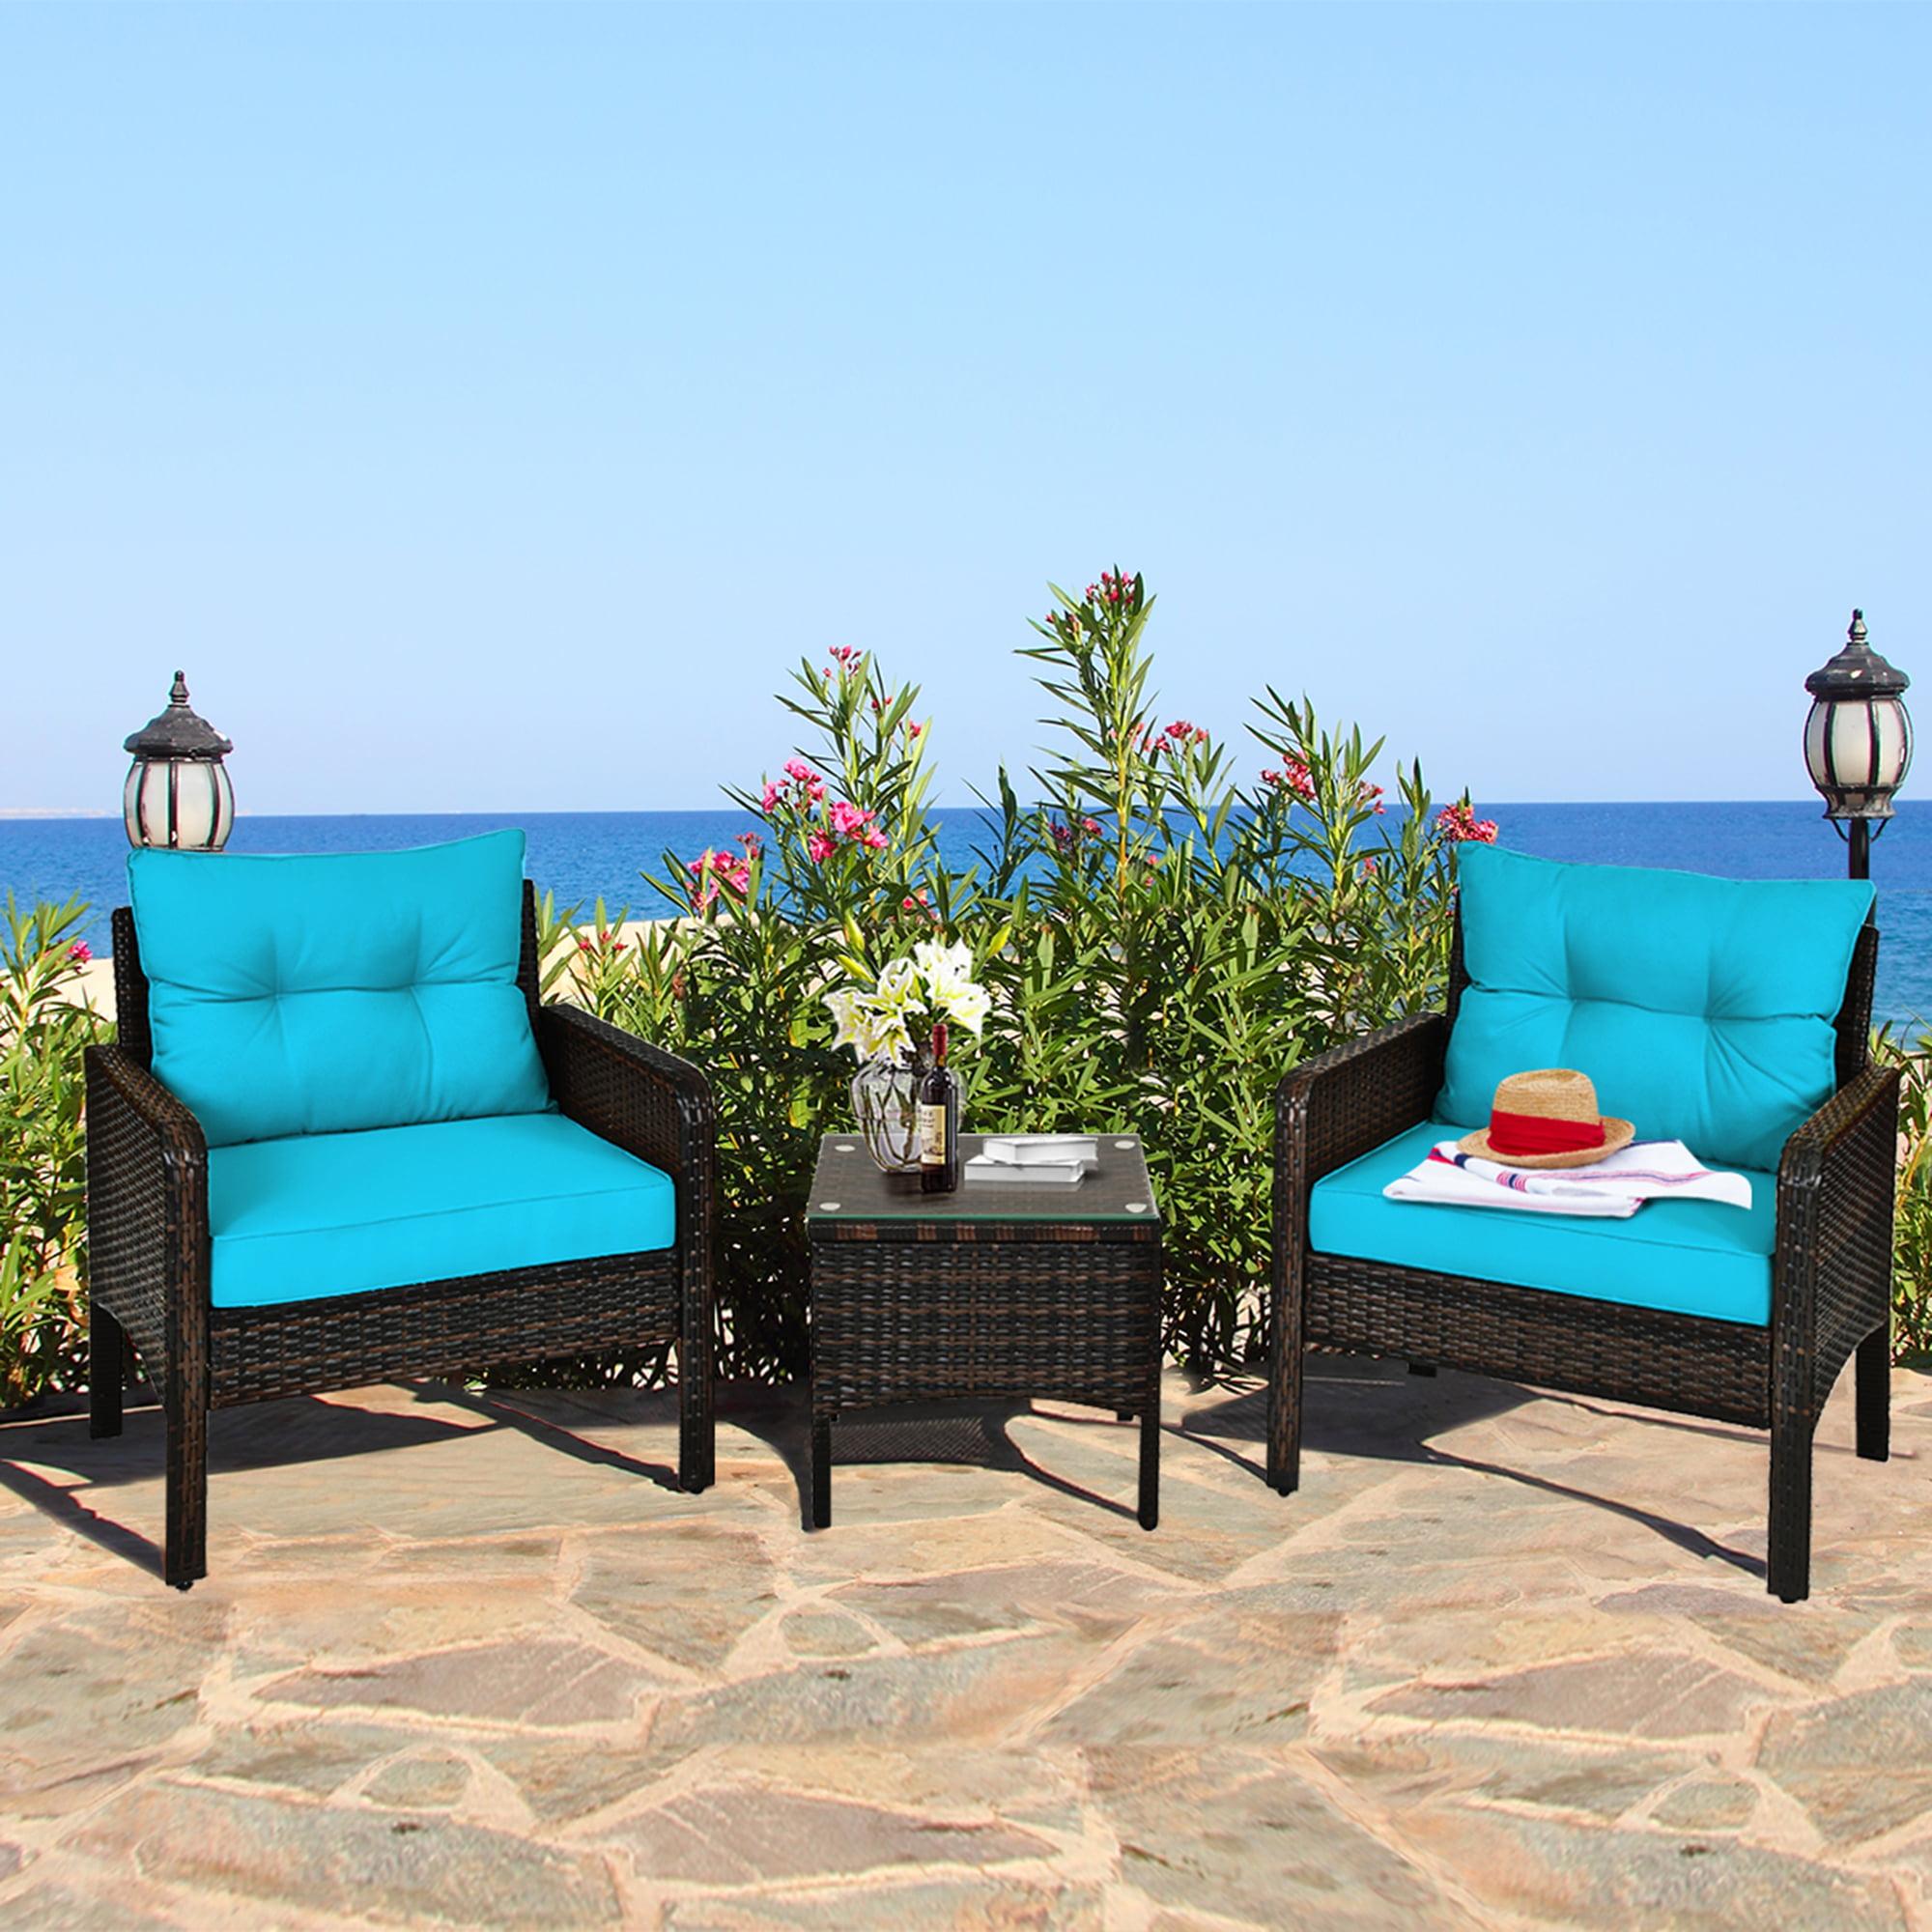 Gymax 3PCS Patio Outdoor Rattan Furniture Set w/ Coffee ...